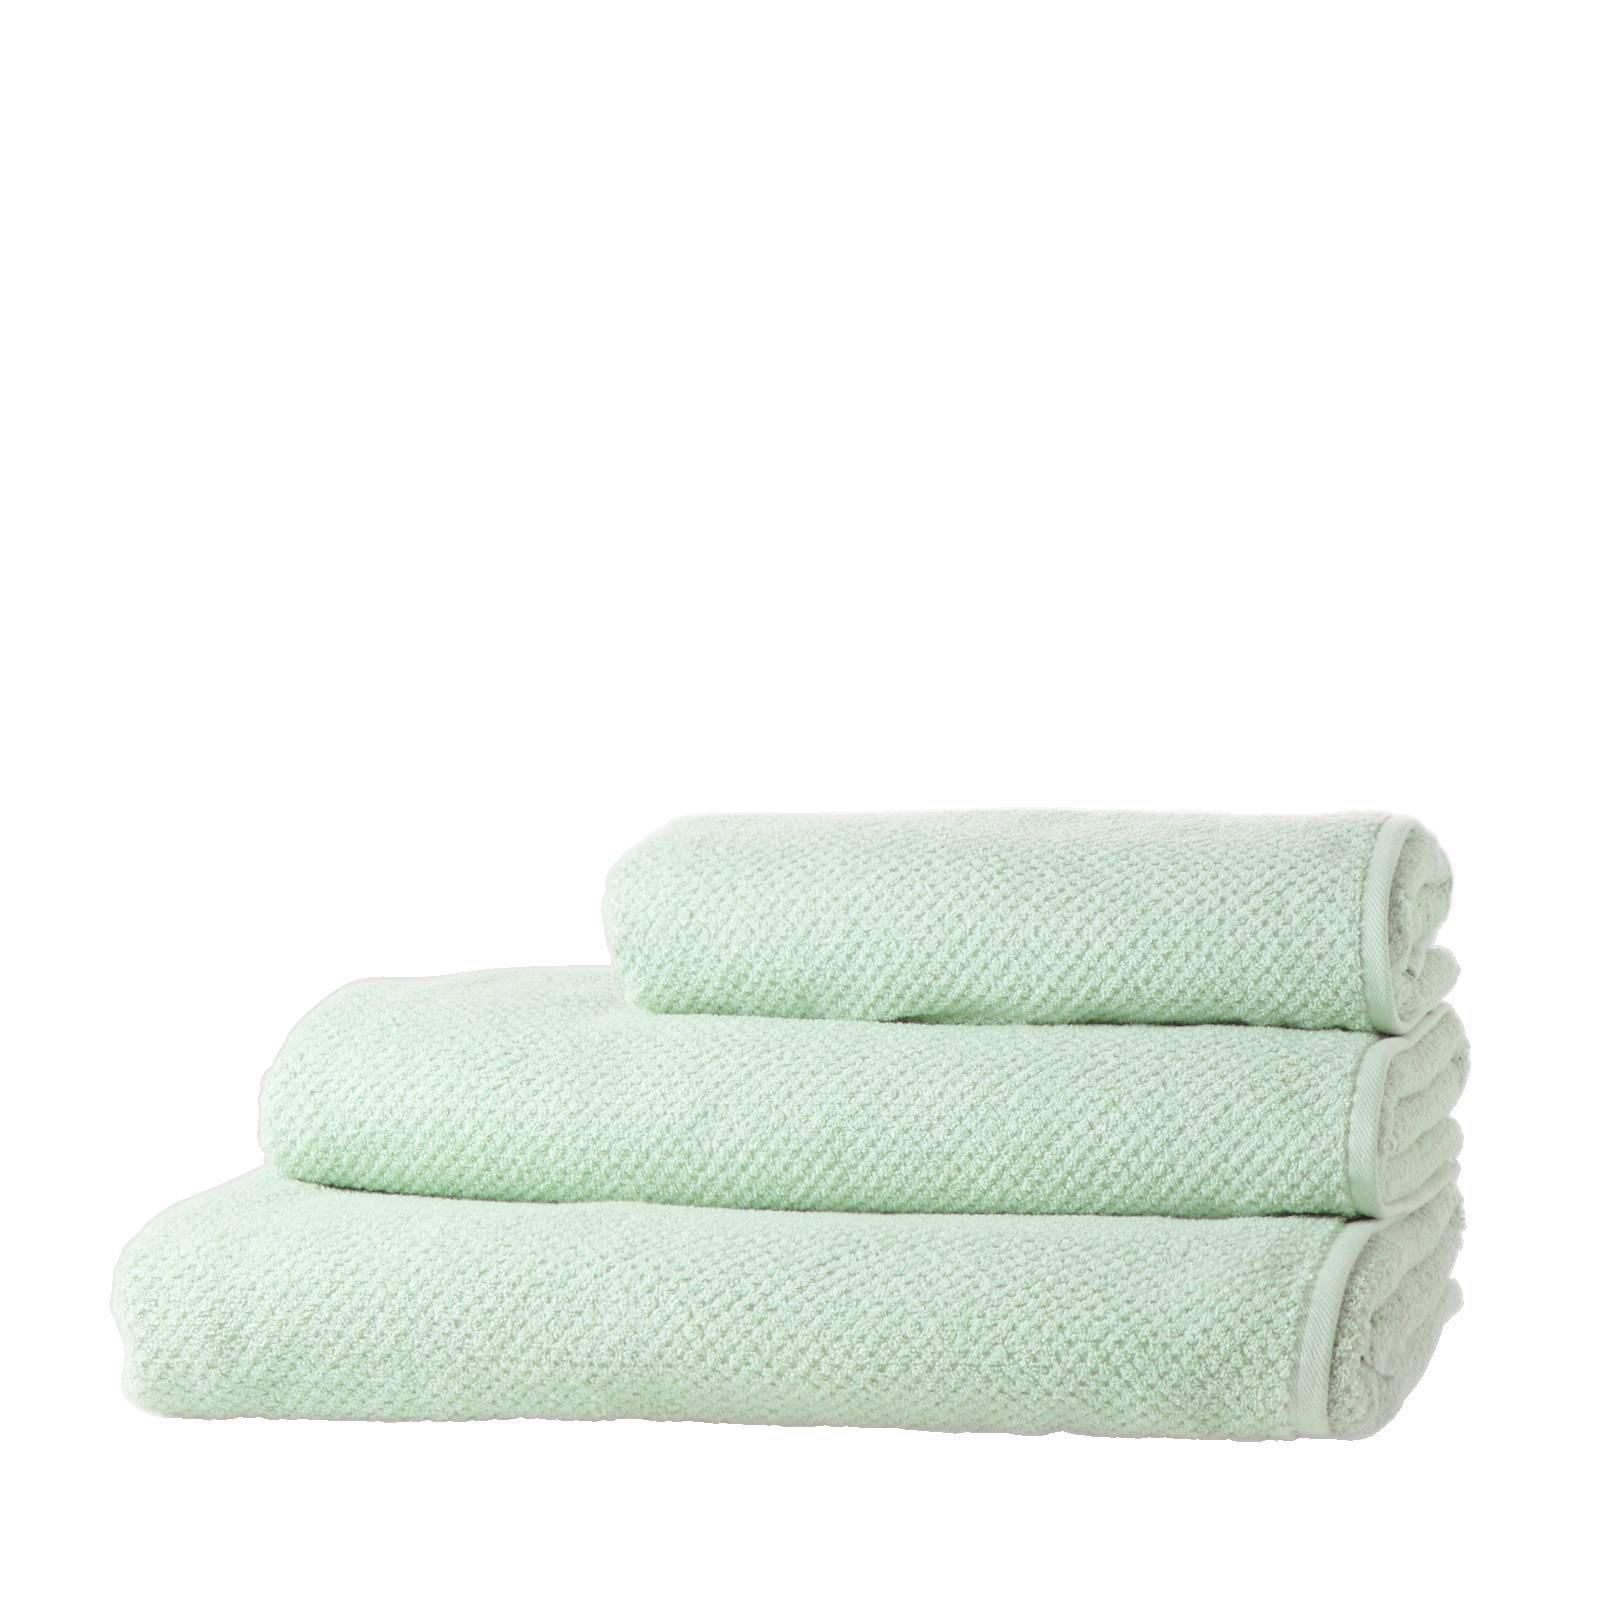 c\u0026a home handdoek (50x100 cm) wehkampc\u0026a home handdoek (50x100 cm), mintgroen